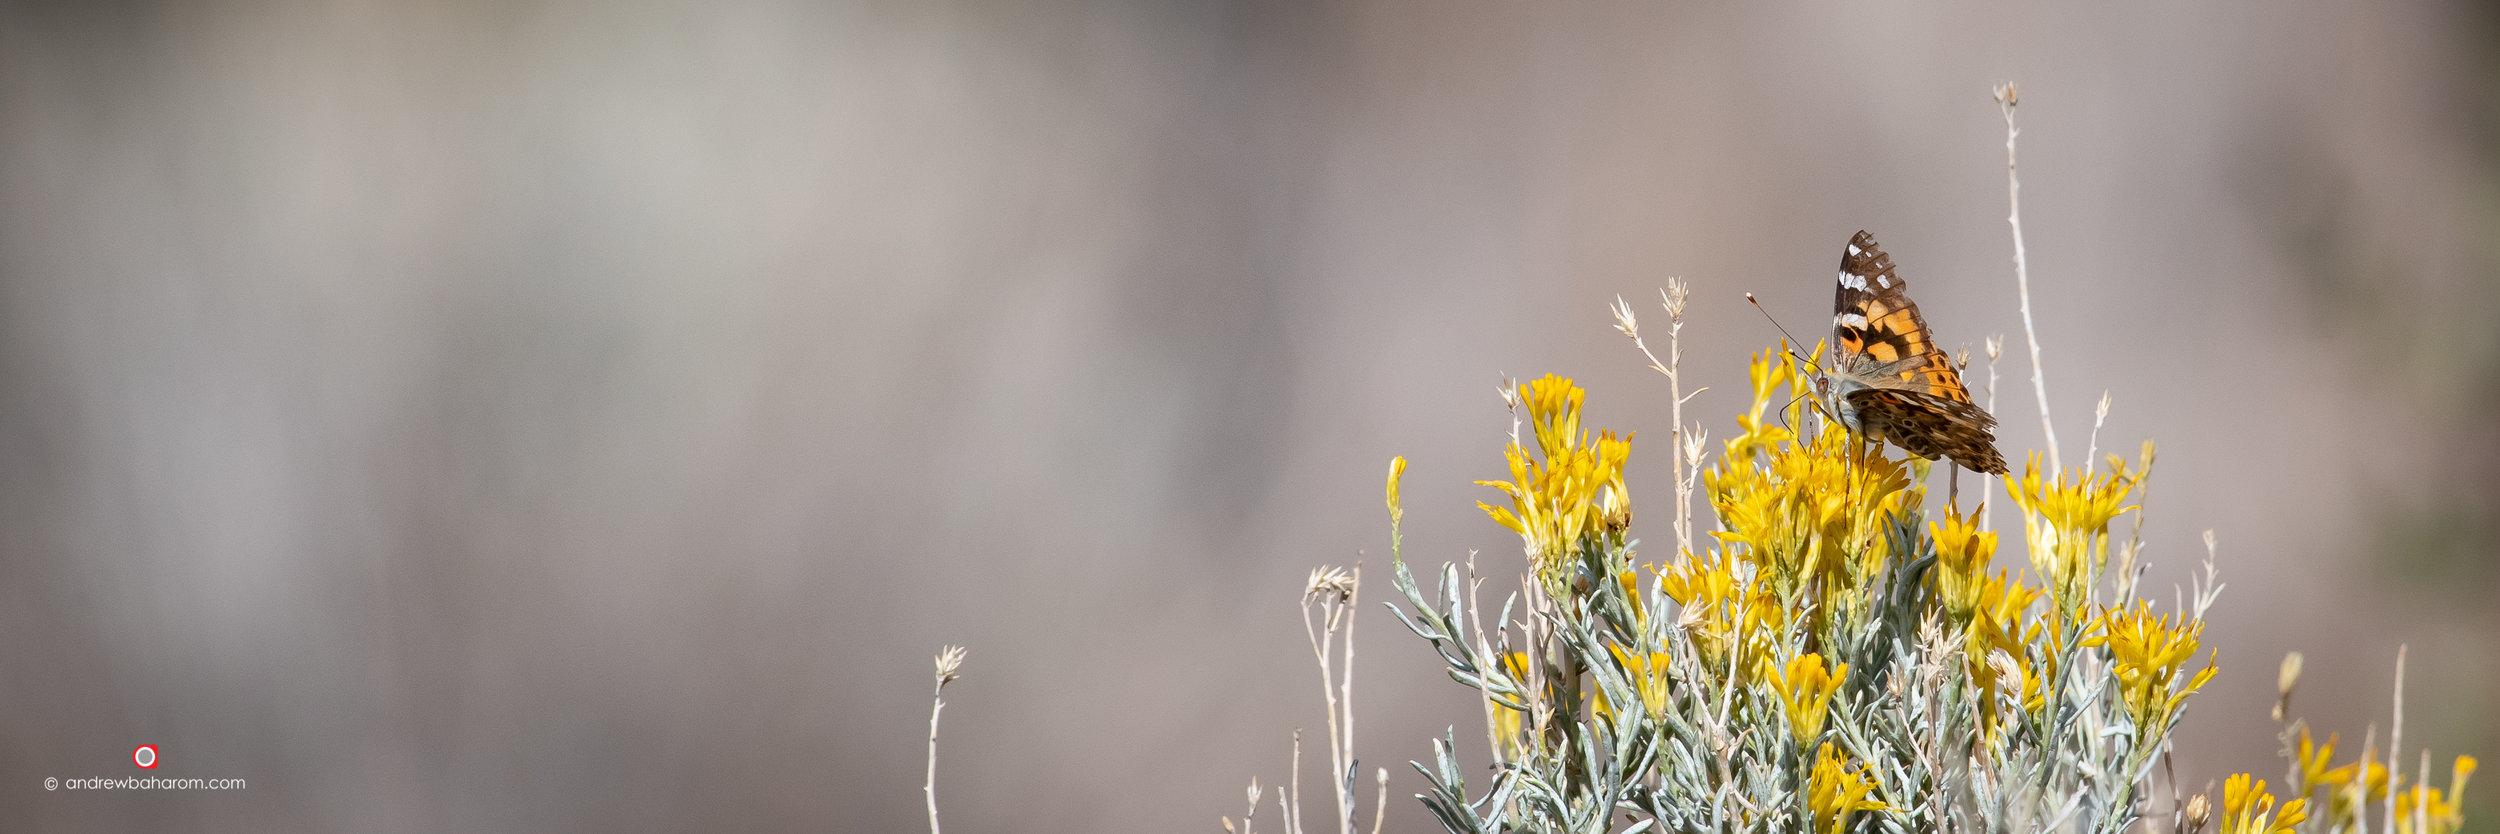 Butterly on Lemon Yellow Flowers.jpg